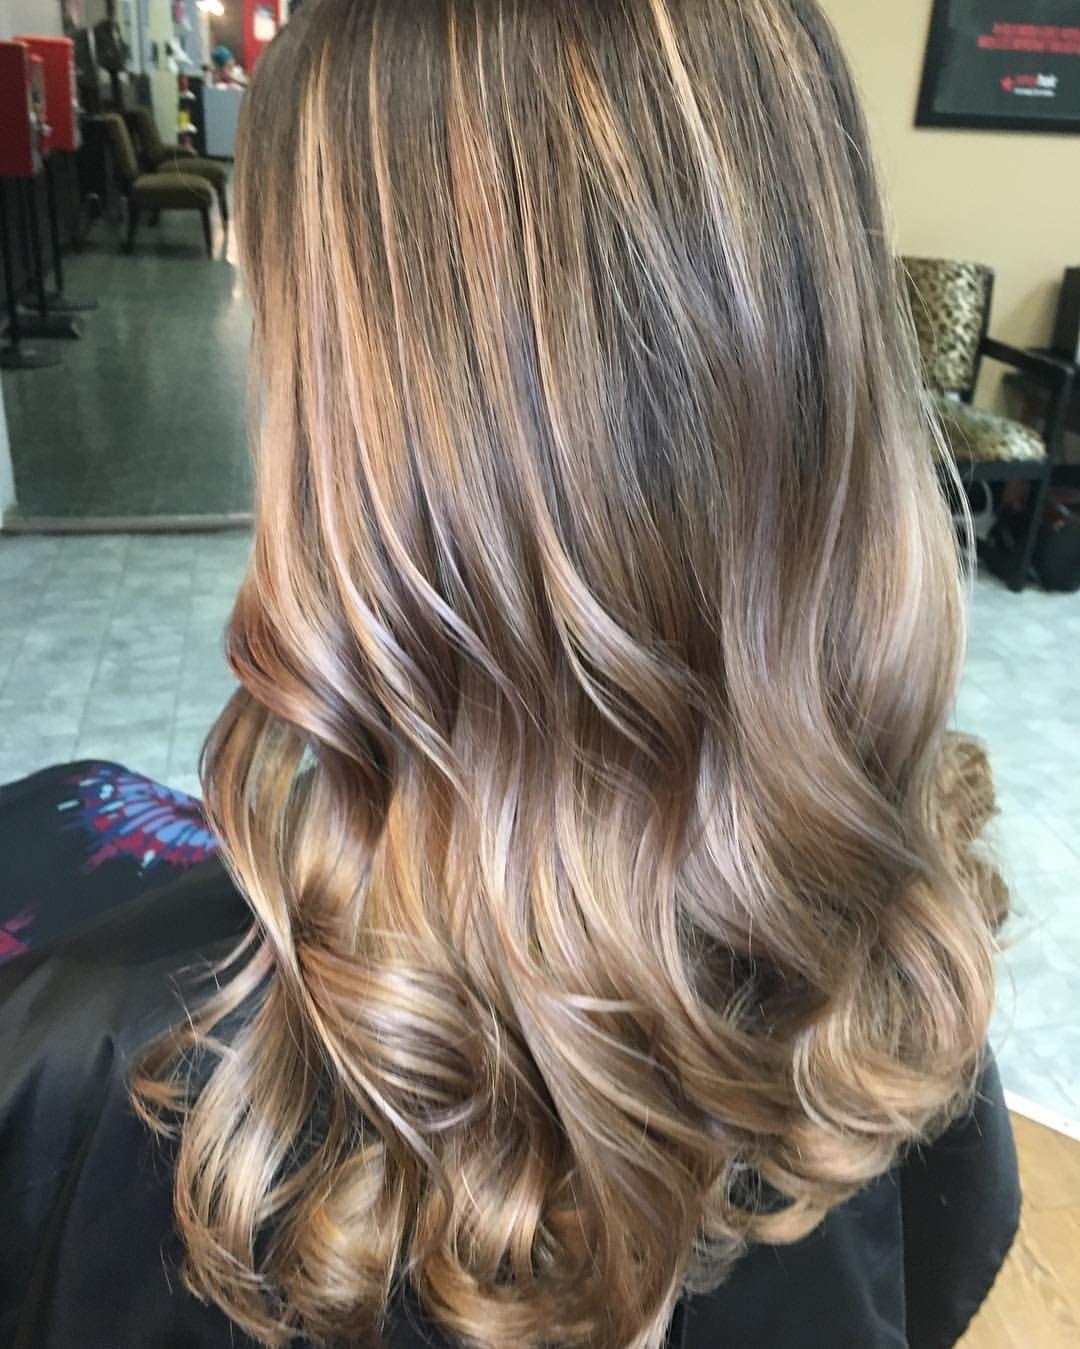 Beige blonde highlights 💞hair by Victoria Sylvis